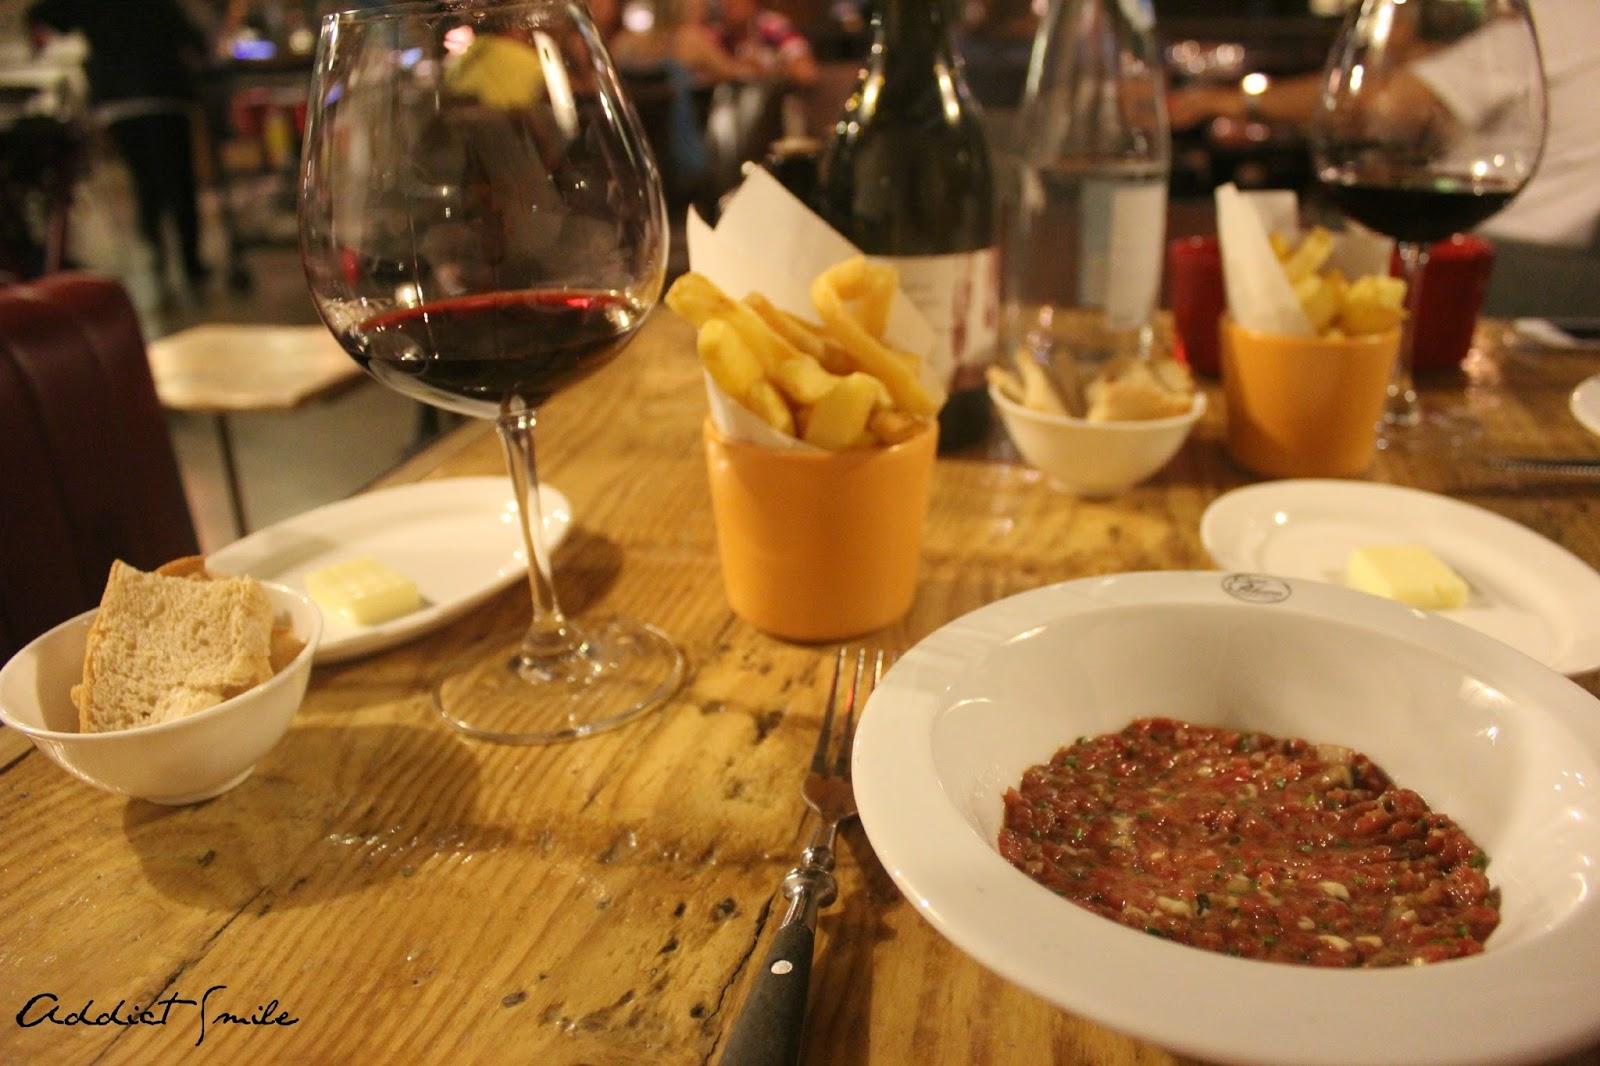 Amantes de la carne casa paloma - Restaurante casa paloma barcelona ...